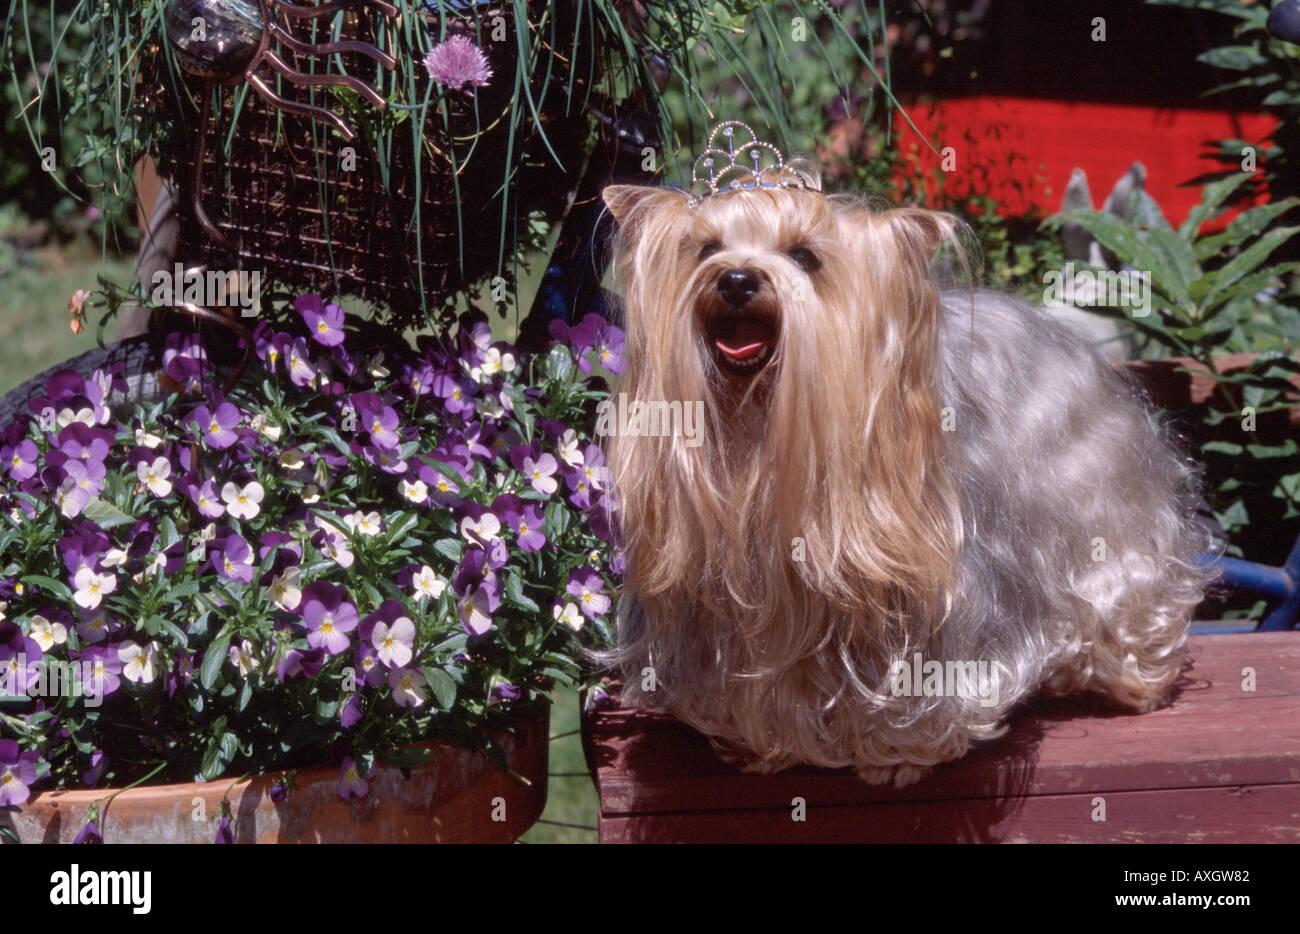 Dog Yorkshire Terrier Yorkie Wearing Tierra Garden Setting Flowers PR 243